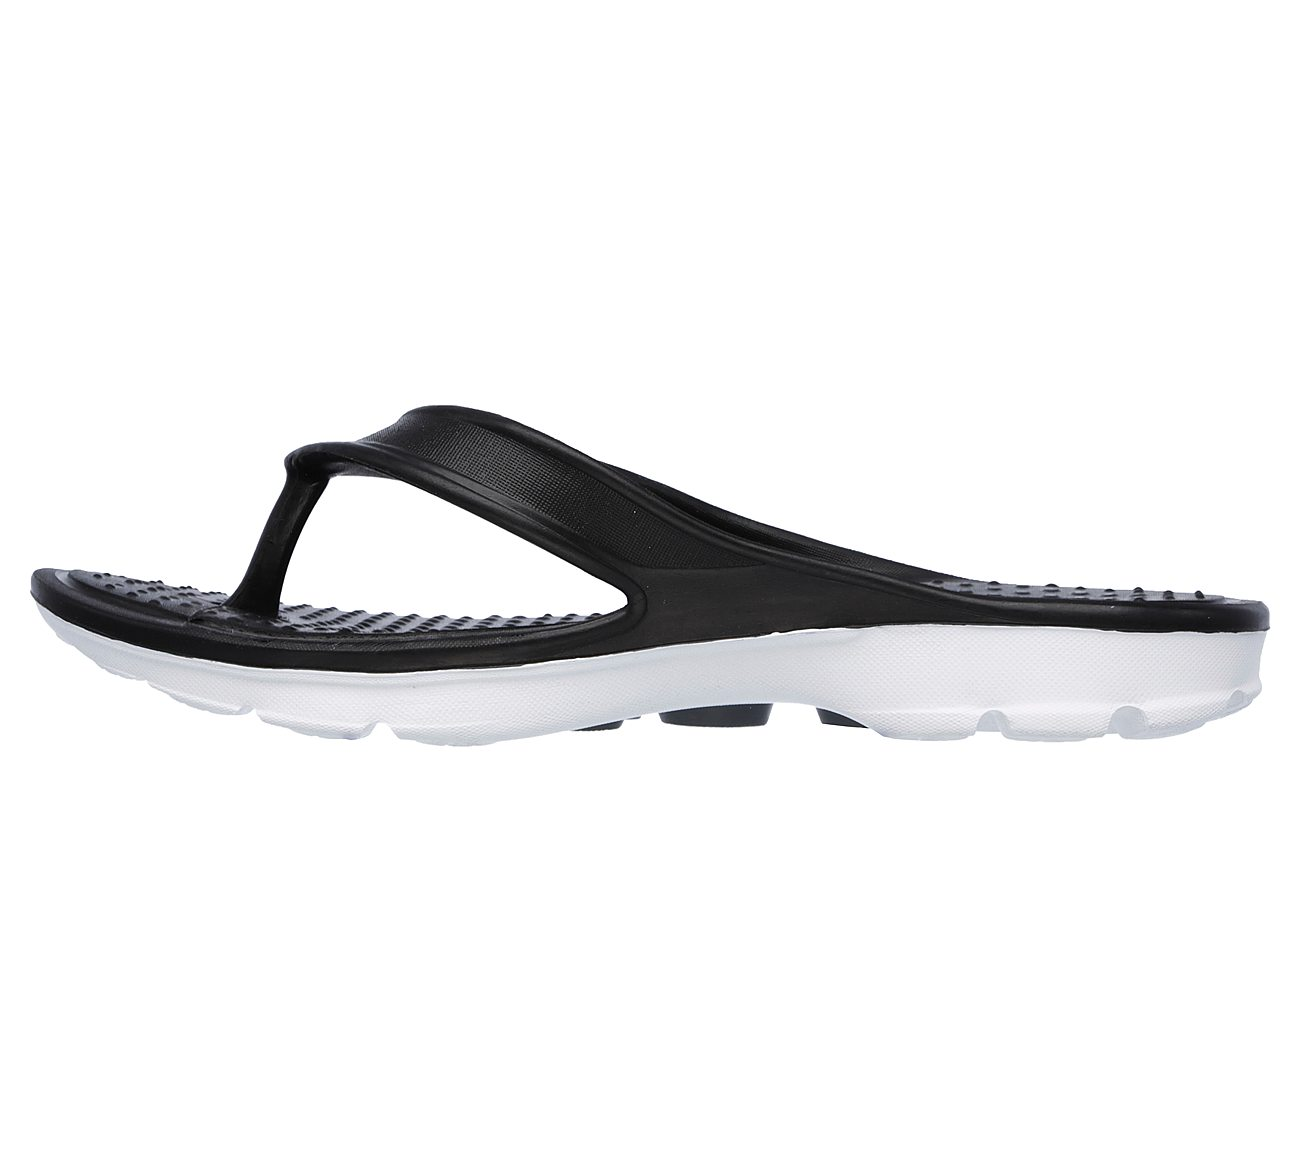 d50b990b4af4 Buy SKECHERS Skechers H2GO - Tidal Wave Skechers Performance Shoes ...